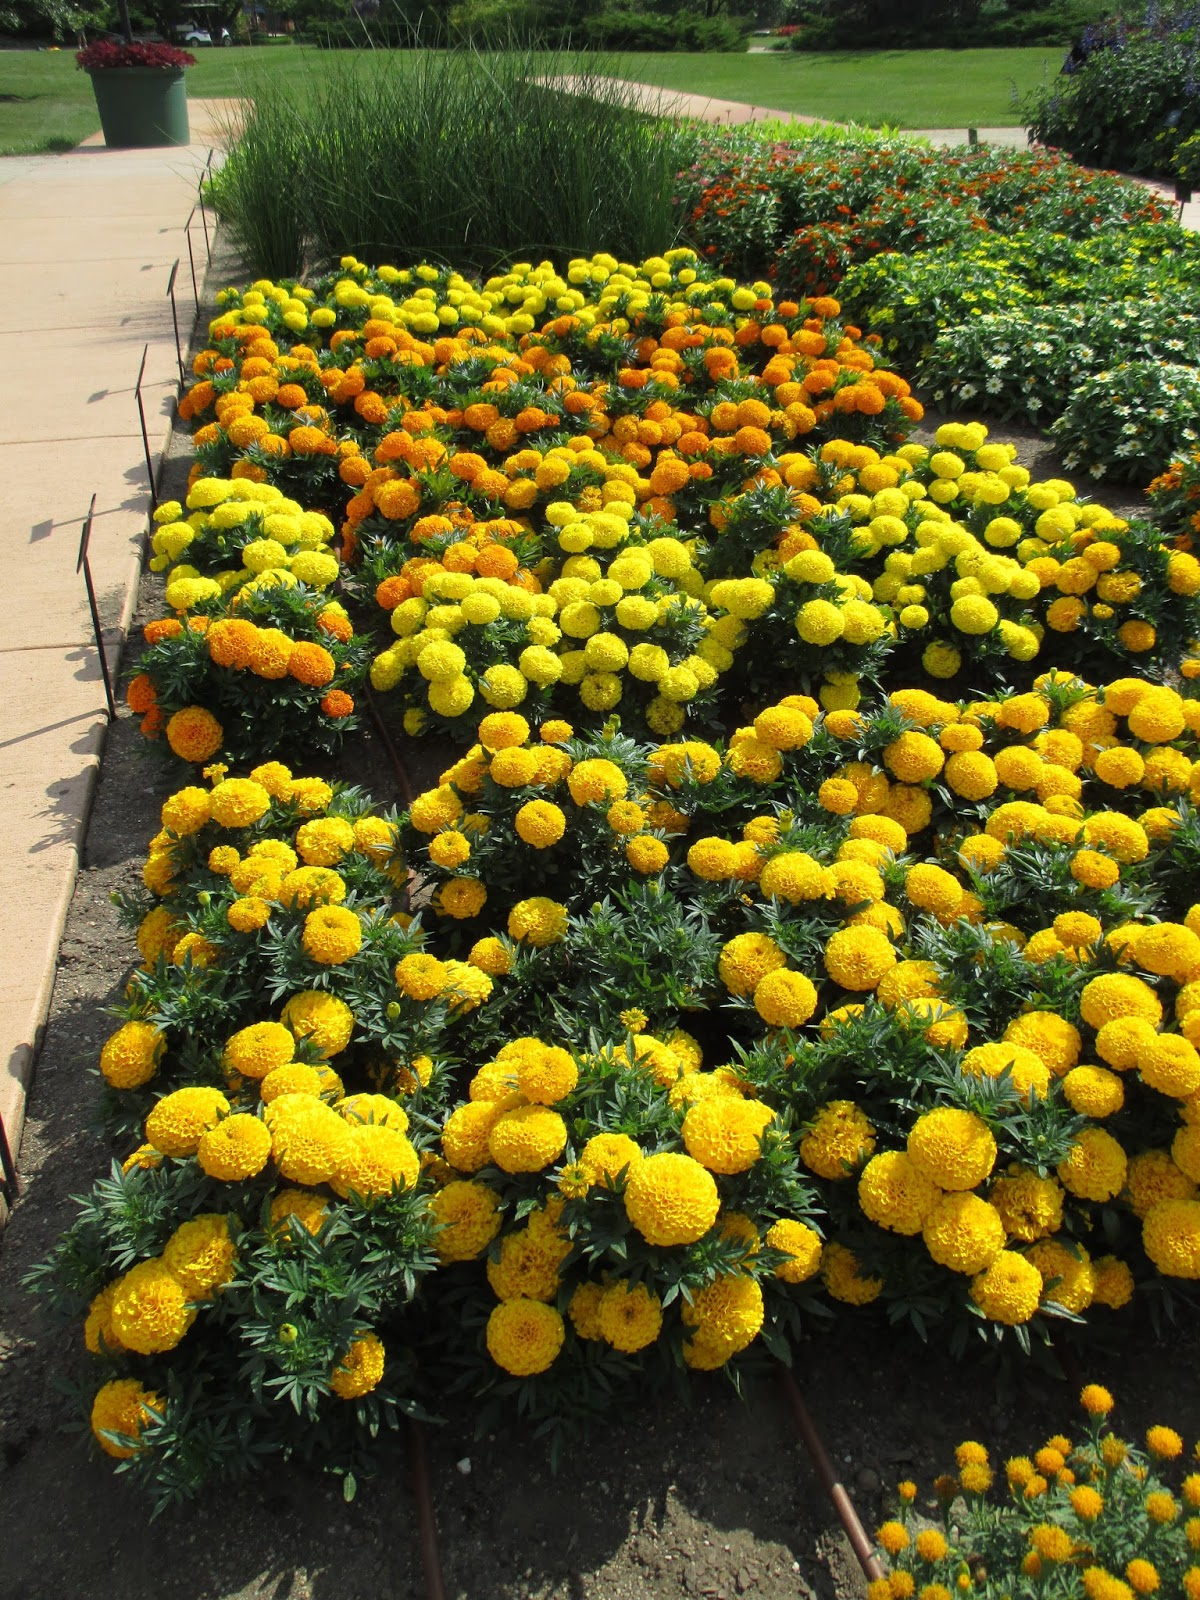 The Marigold Tarot Major Arcana The: Hort Blog: Fist-Sized Marigolds